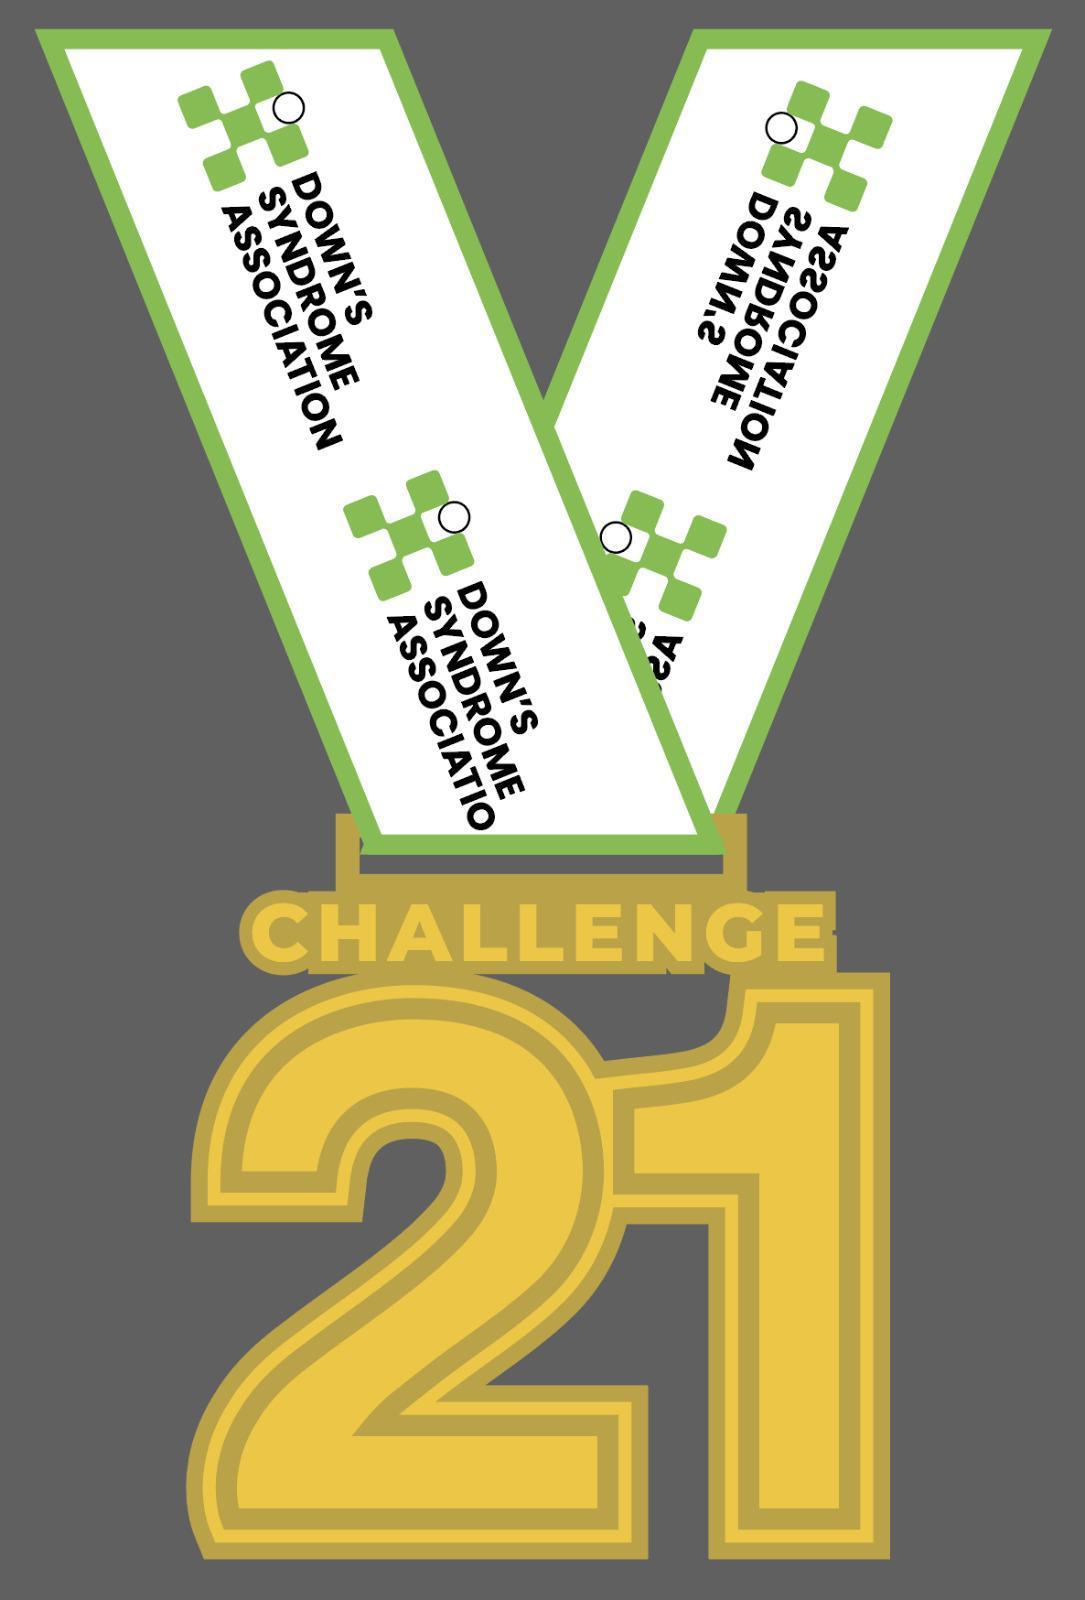 Challenge 21